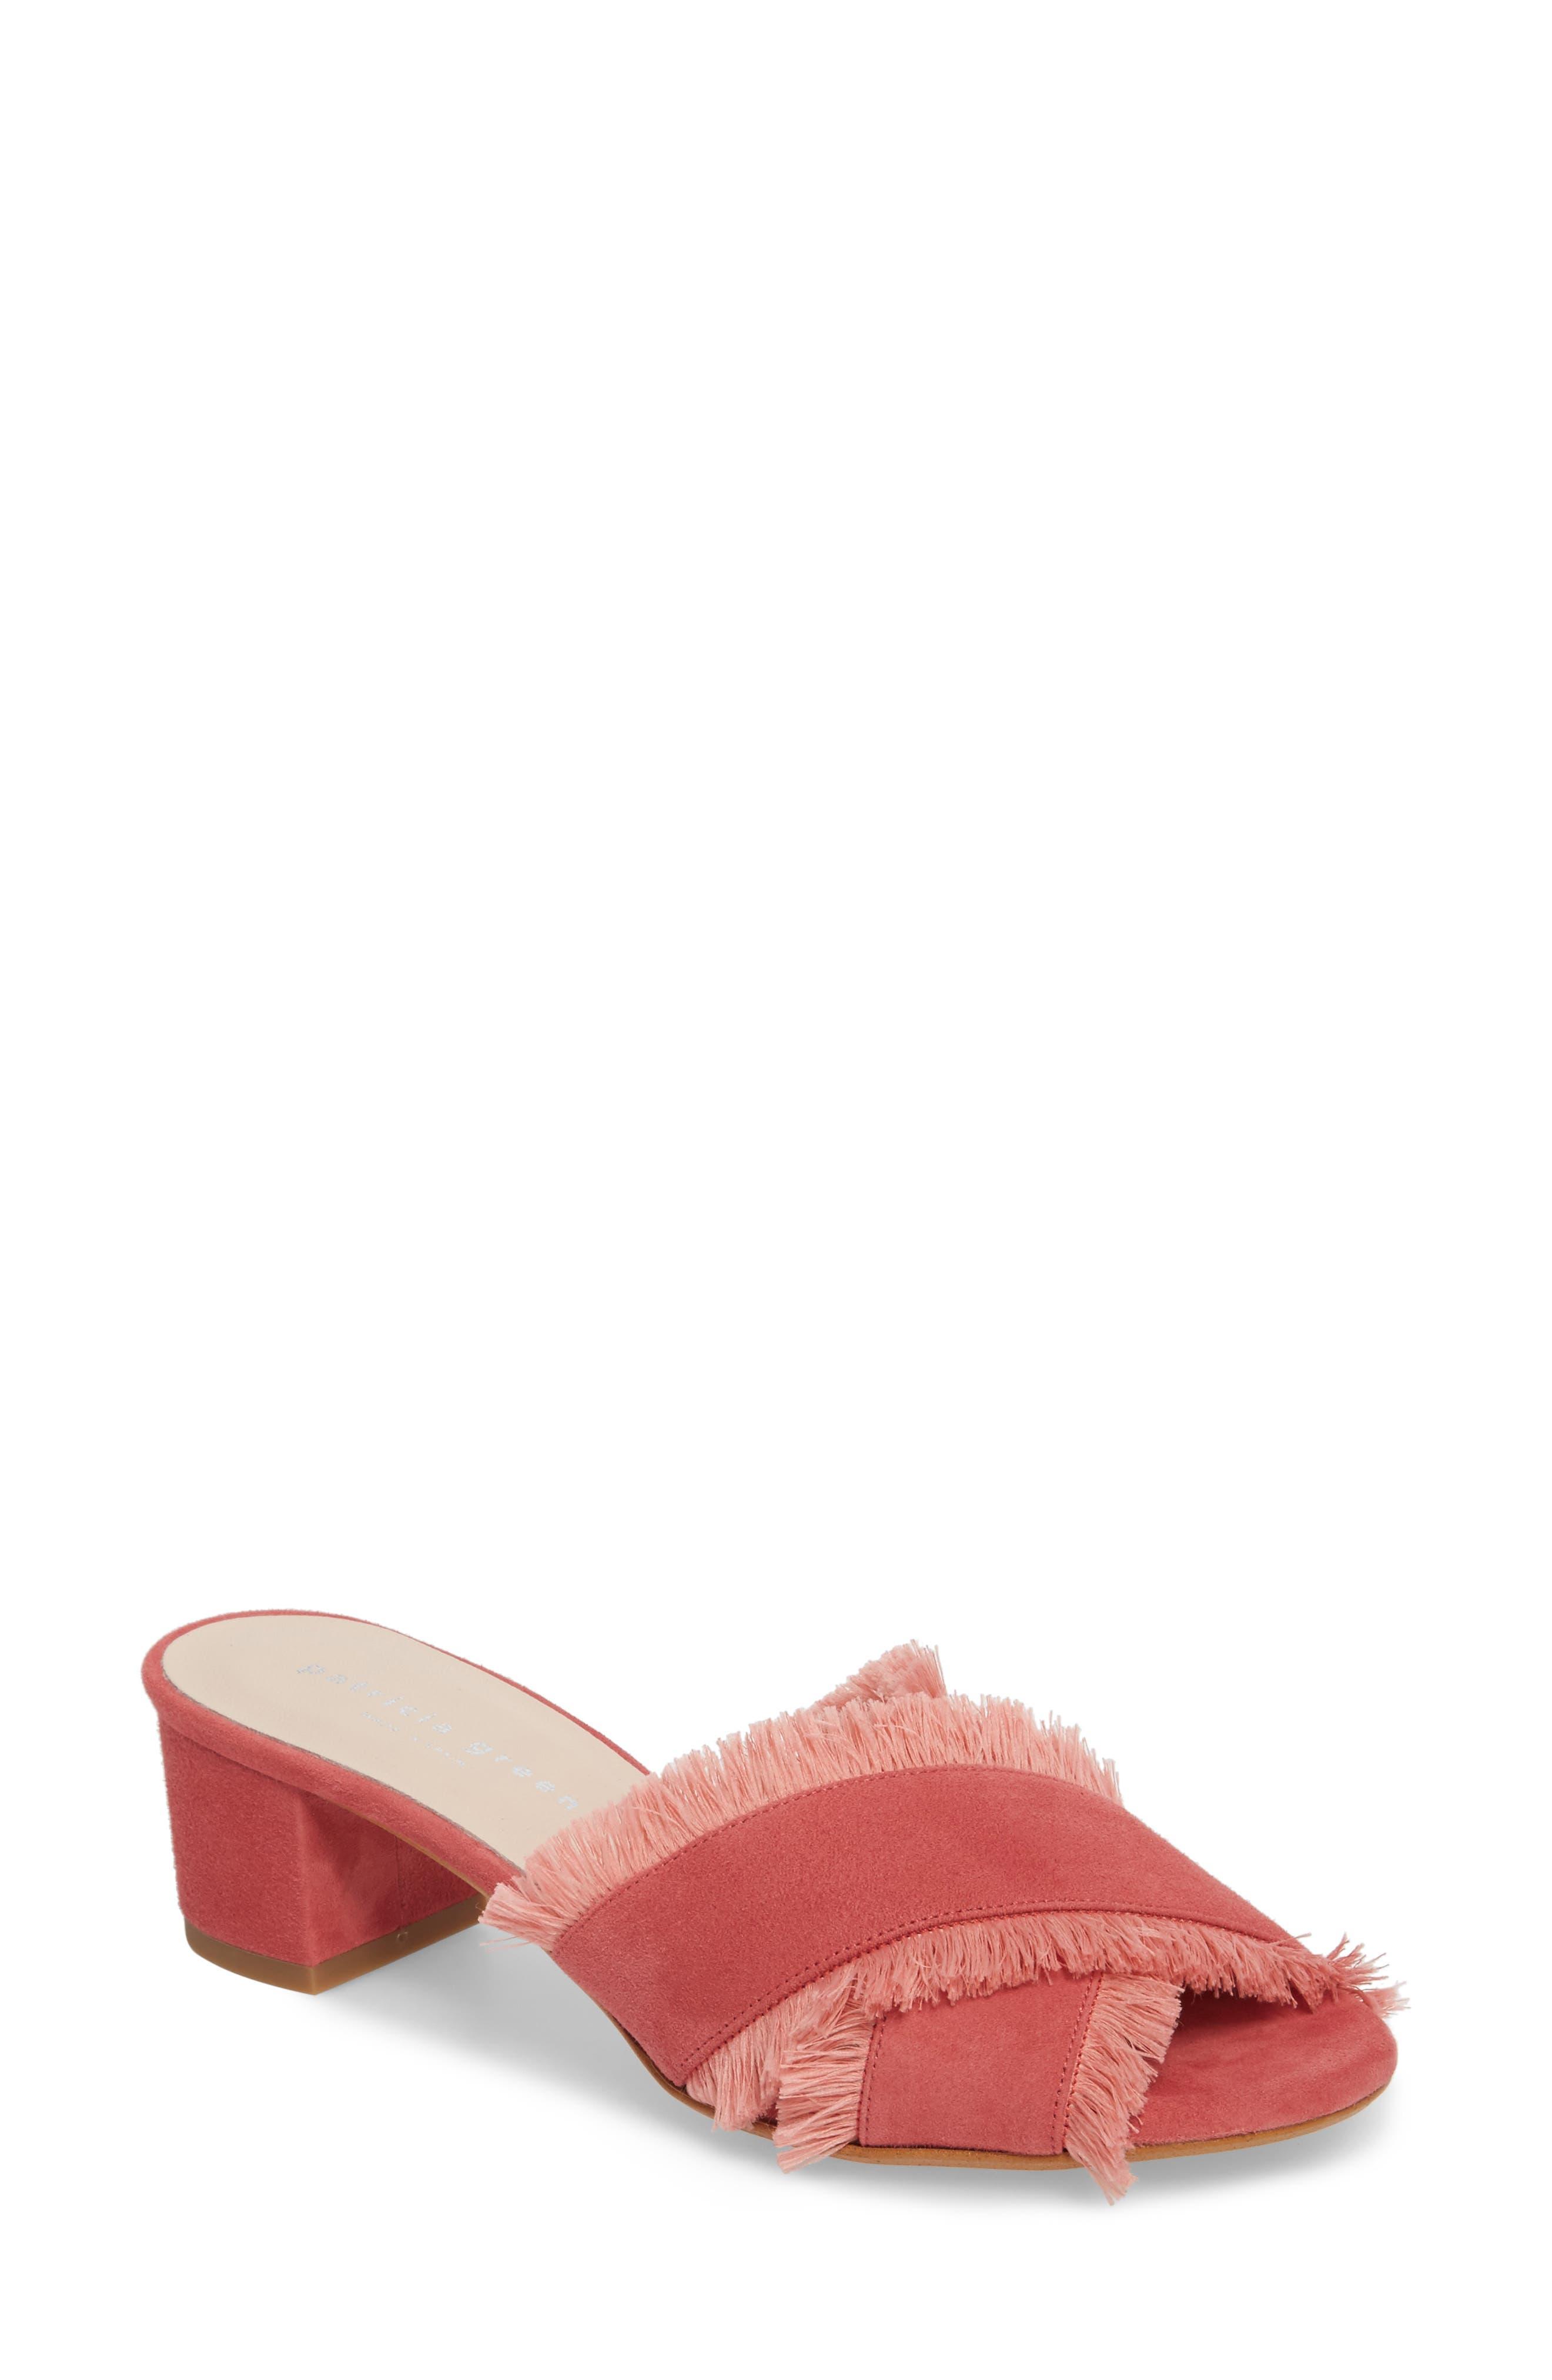 Patricia Green Kate Slide Sandal, Pink